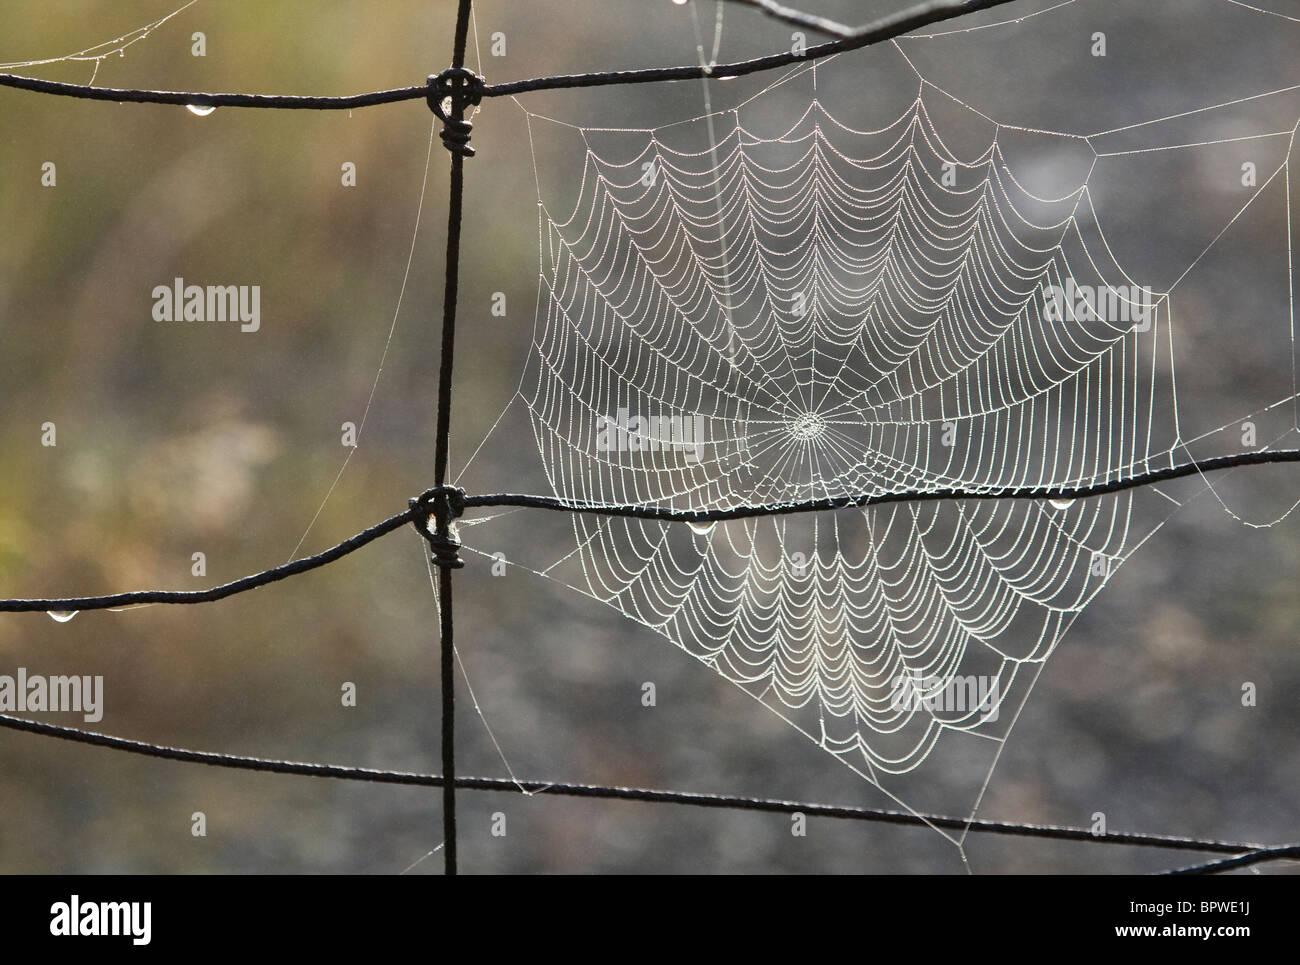 Spider's orb web on wire fence, Sudbury, Ontario, Canada. - Stock Image